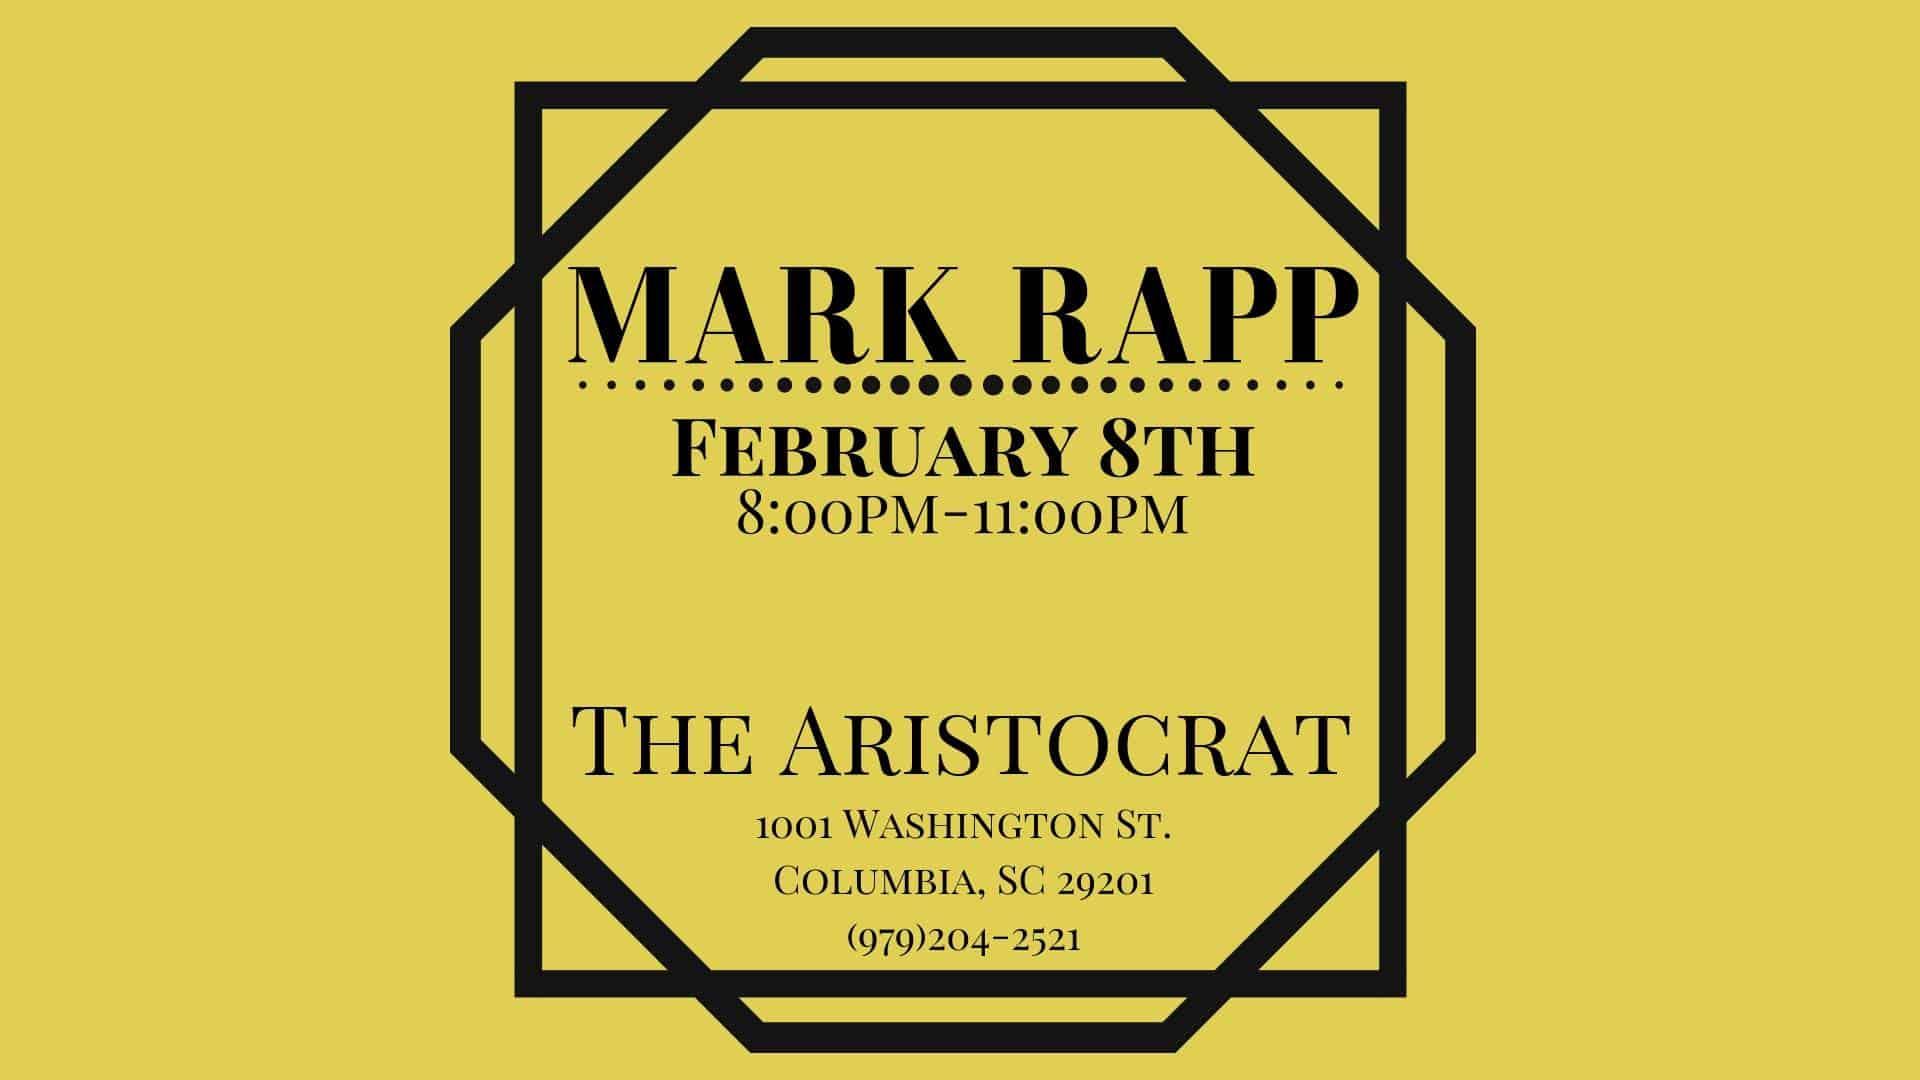 The Aristocrat Jazz